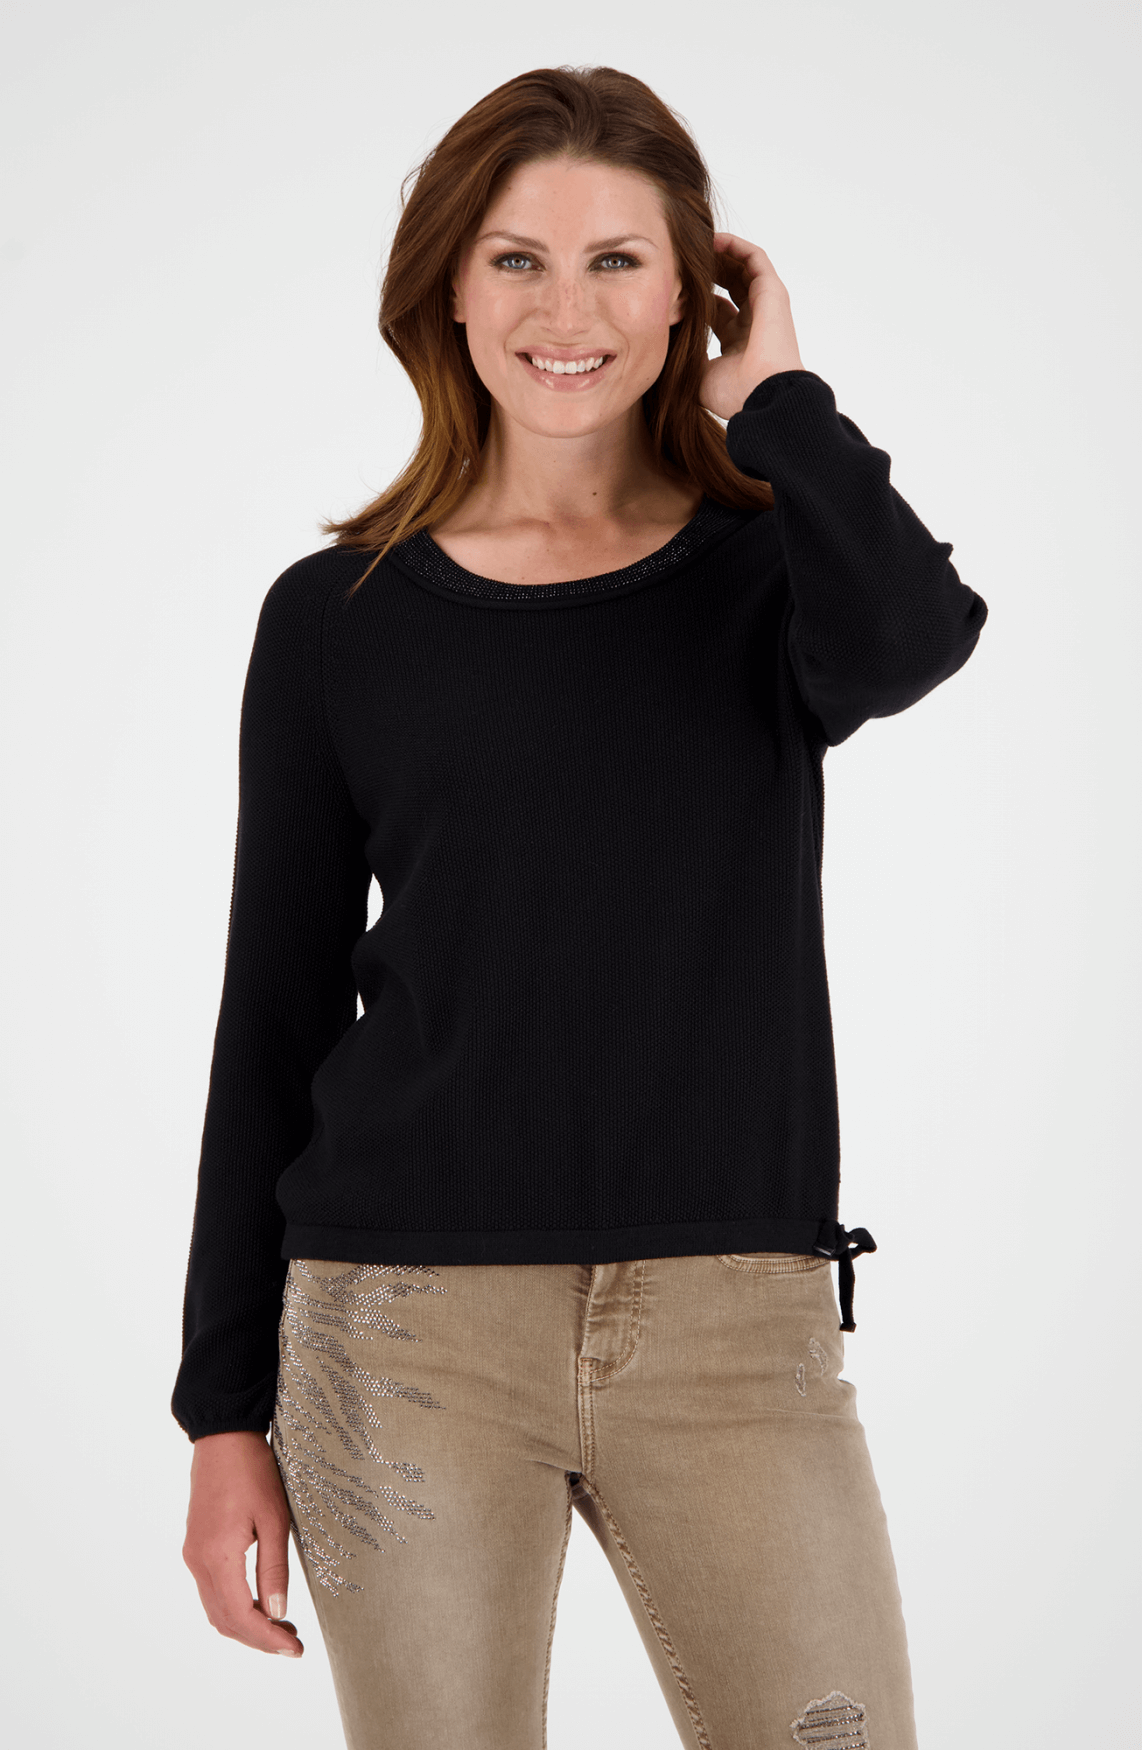 Monari Dames Pullover met strass hals Zwart